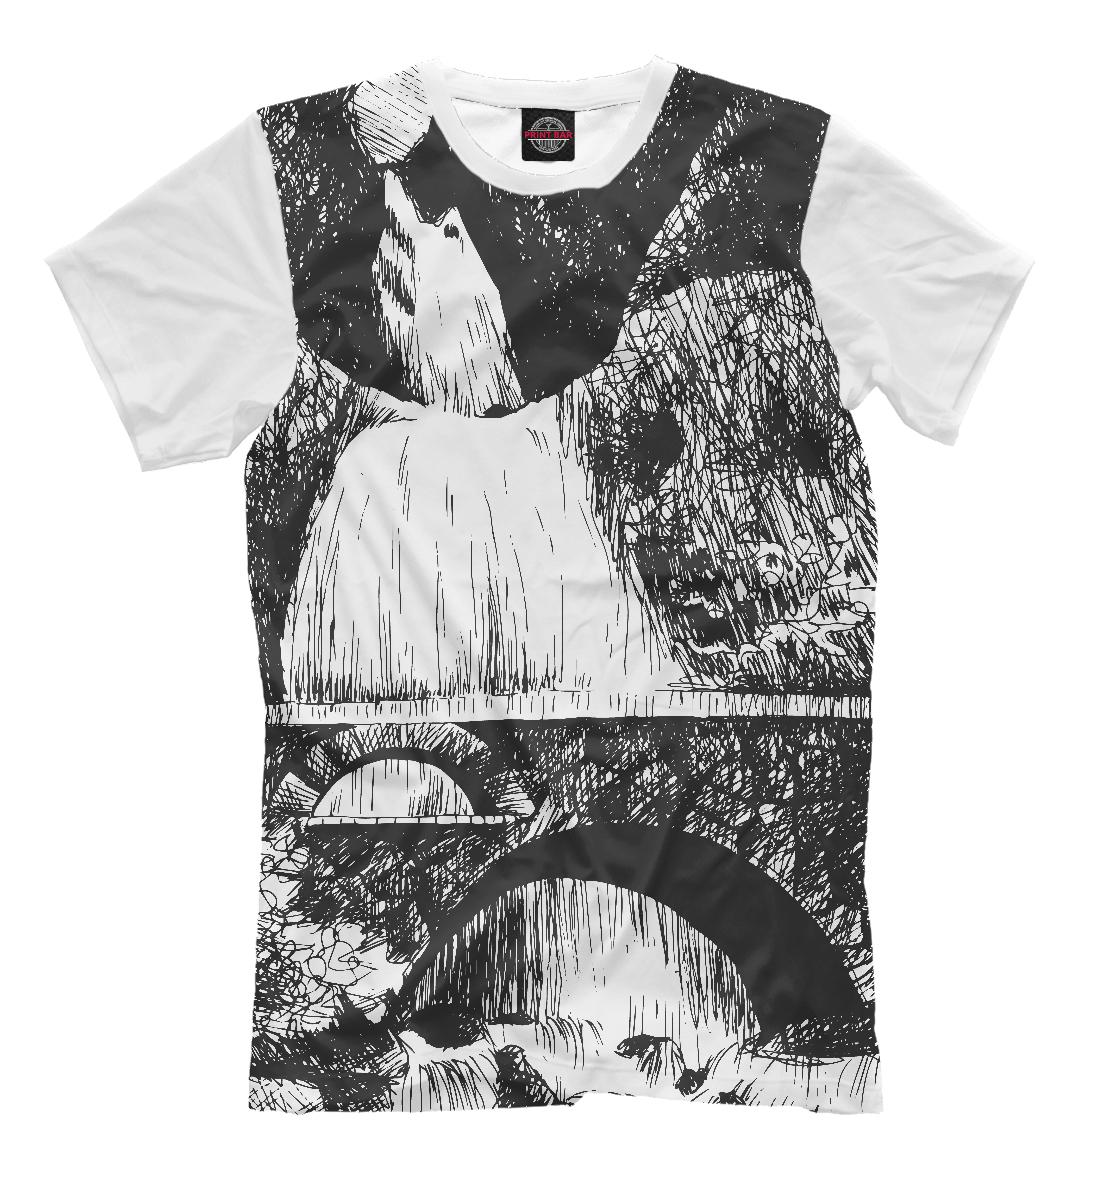 Купить Мост у горного водопада, Printbar, Футболки, PEY-199265-fut-2